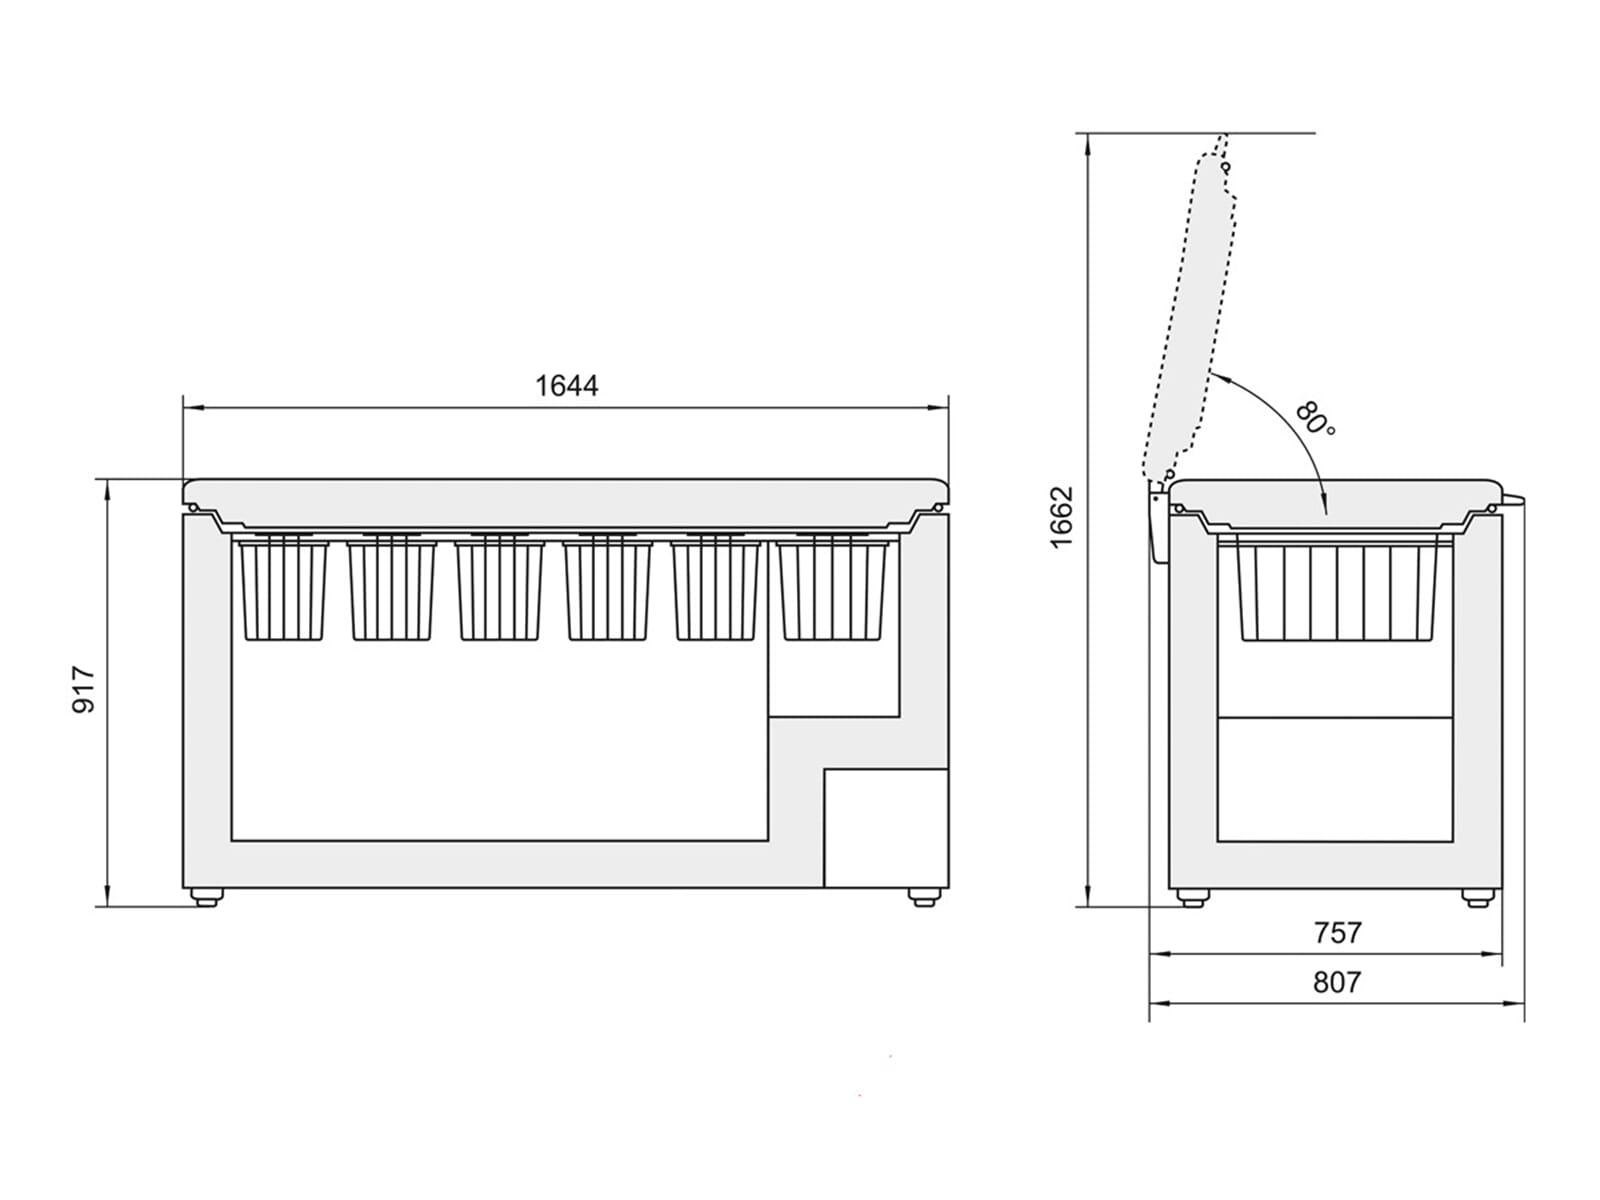 liebherr gtp4656 gefriertruhe wei f r 1124 90 eur shop. Black Bedroom Furniture Sets. Home Design Ideas